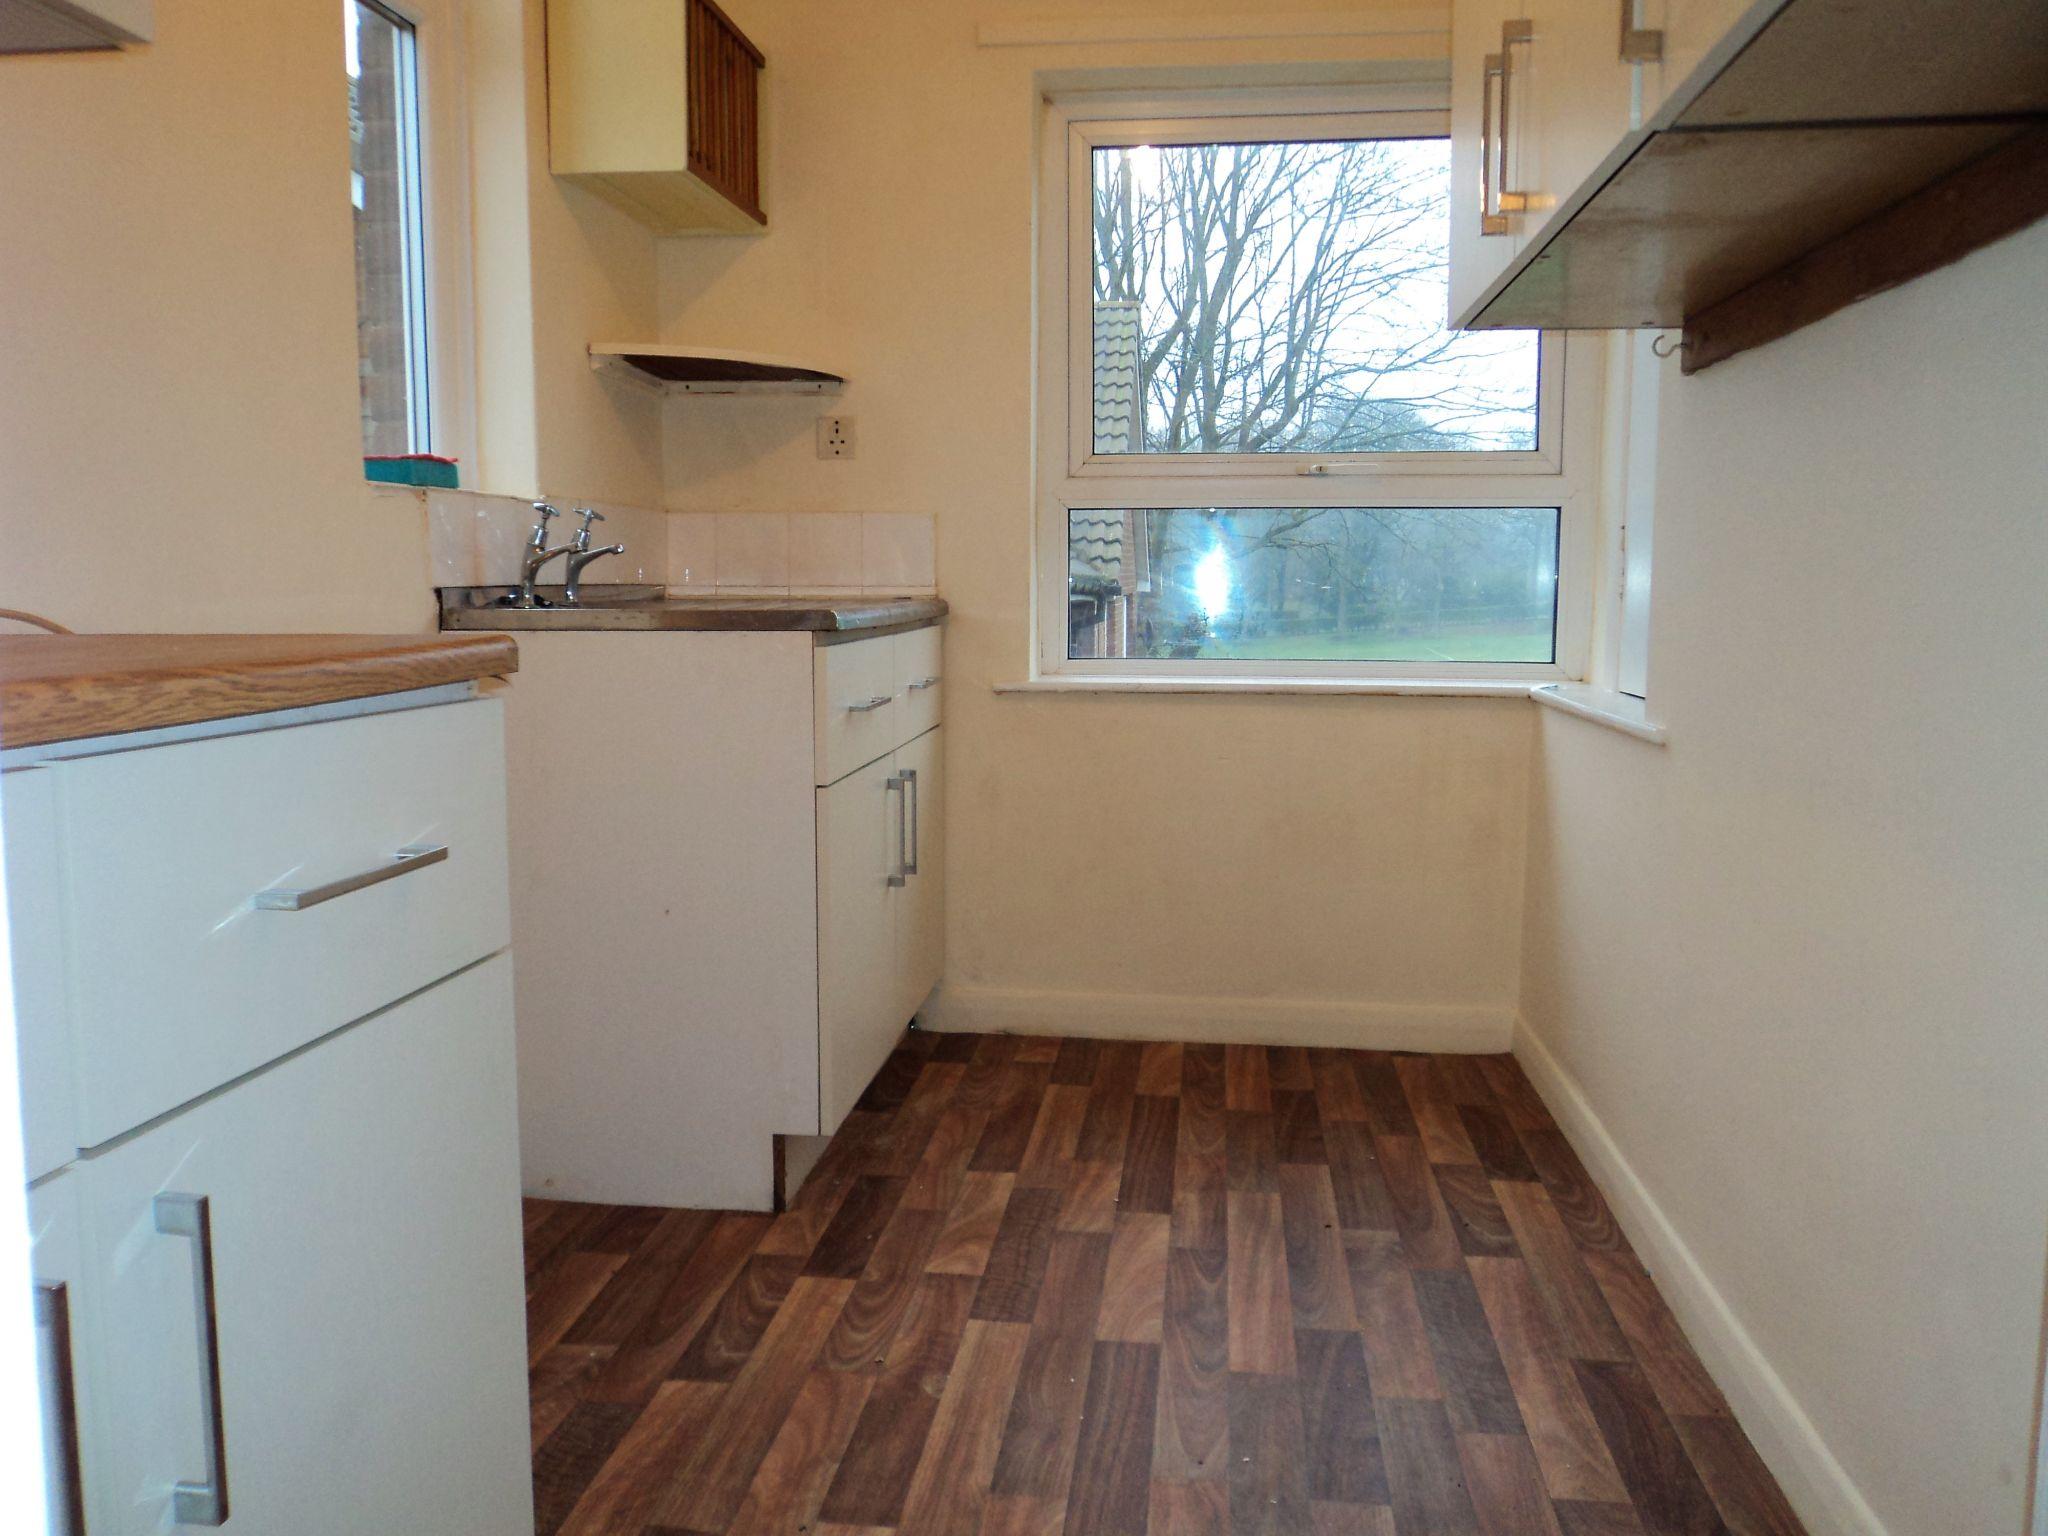 1 Bedroom Flat Flat/apartment To Rent - Photograph 1